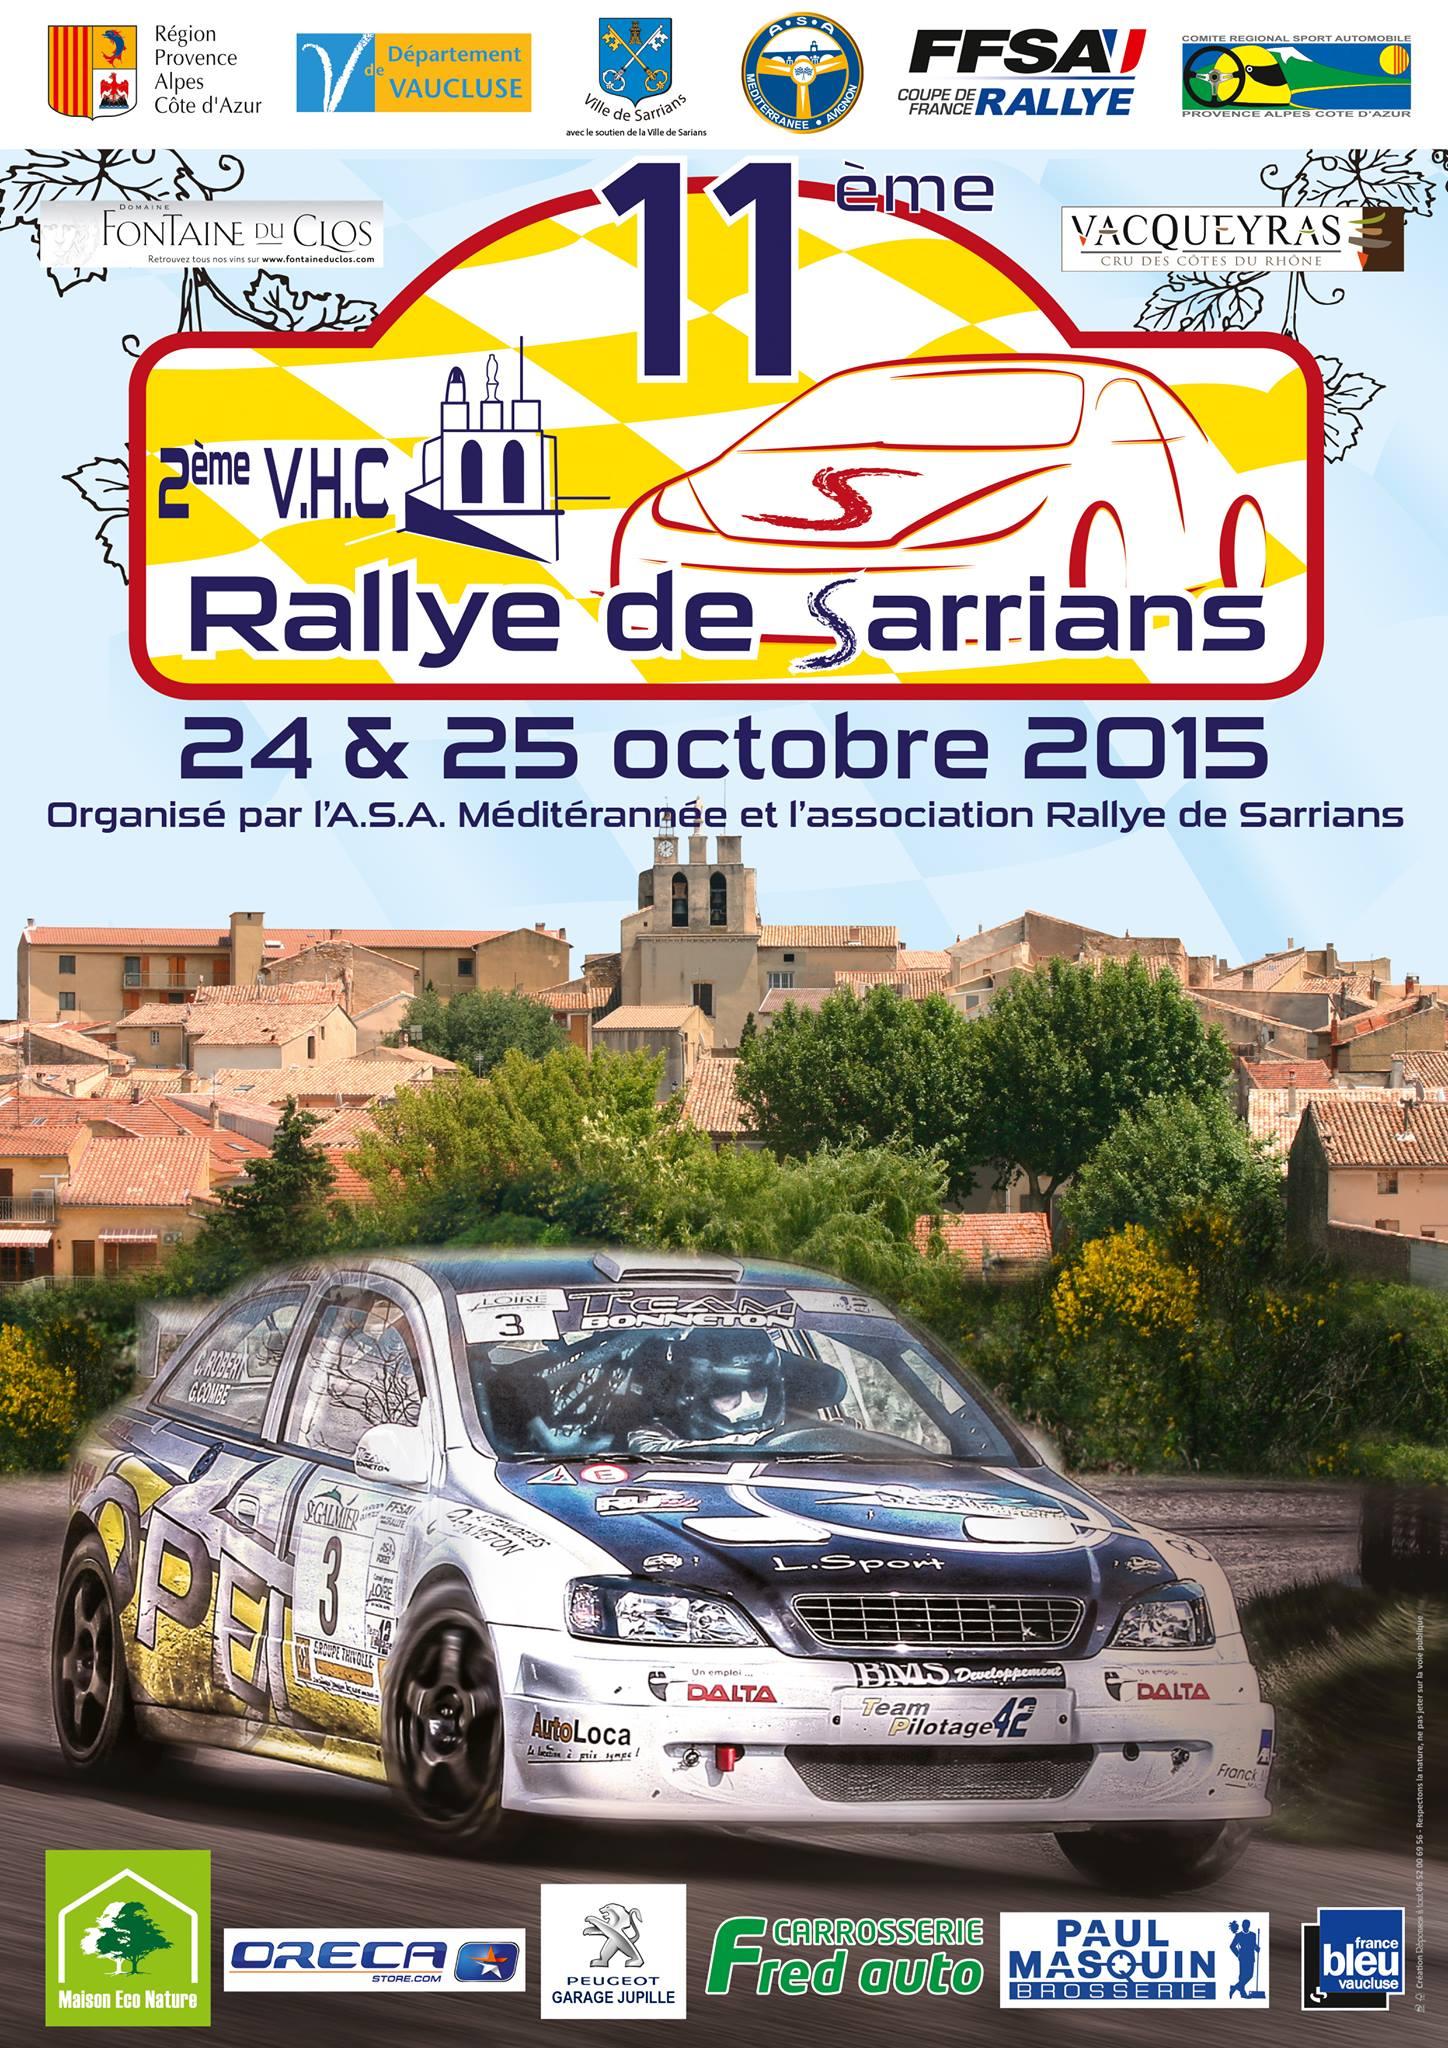 Rallye de Sarrians 2015